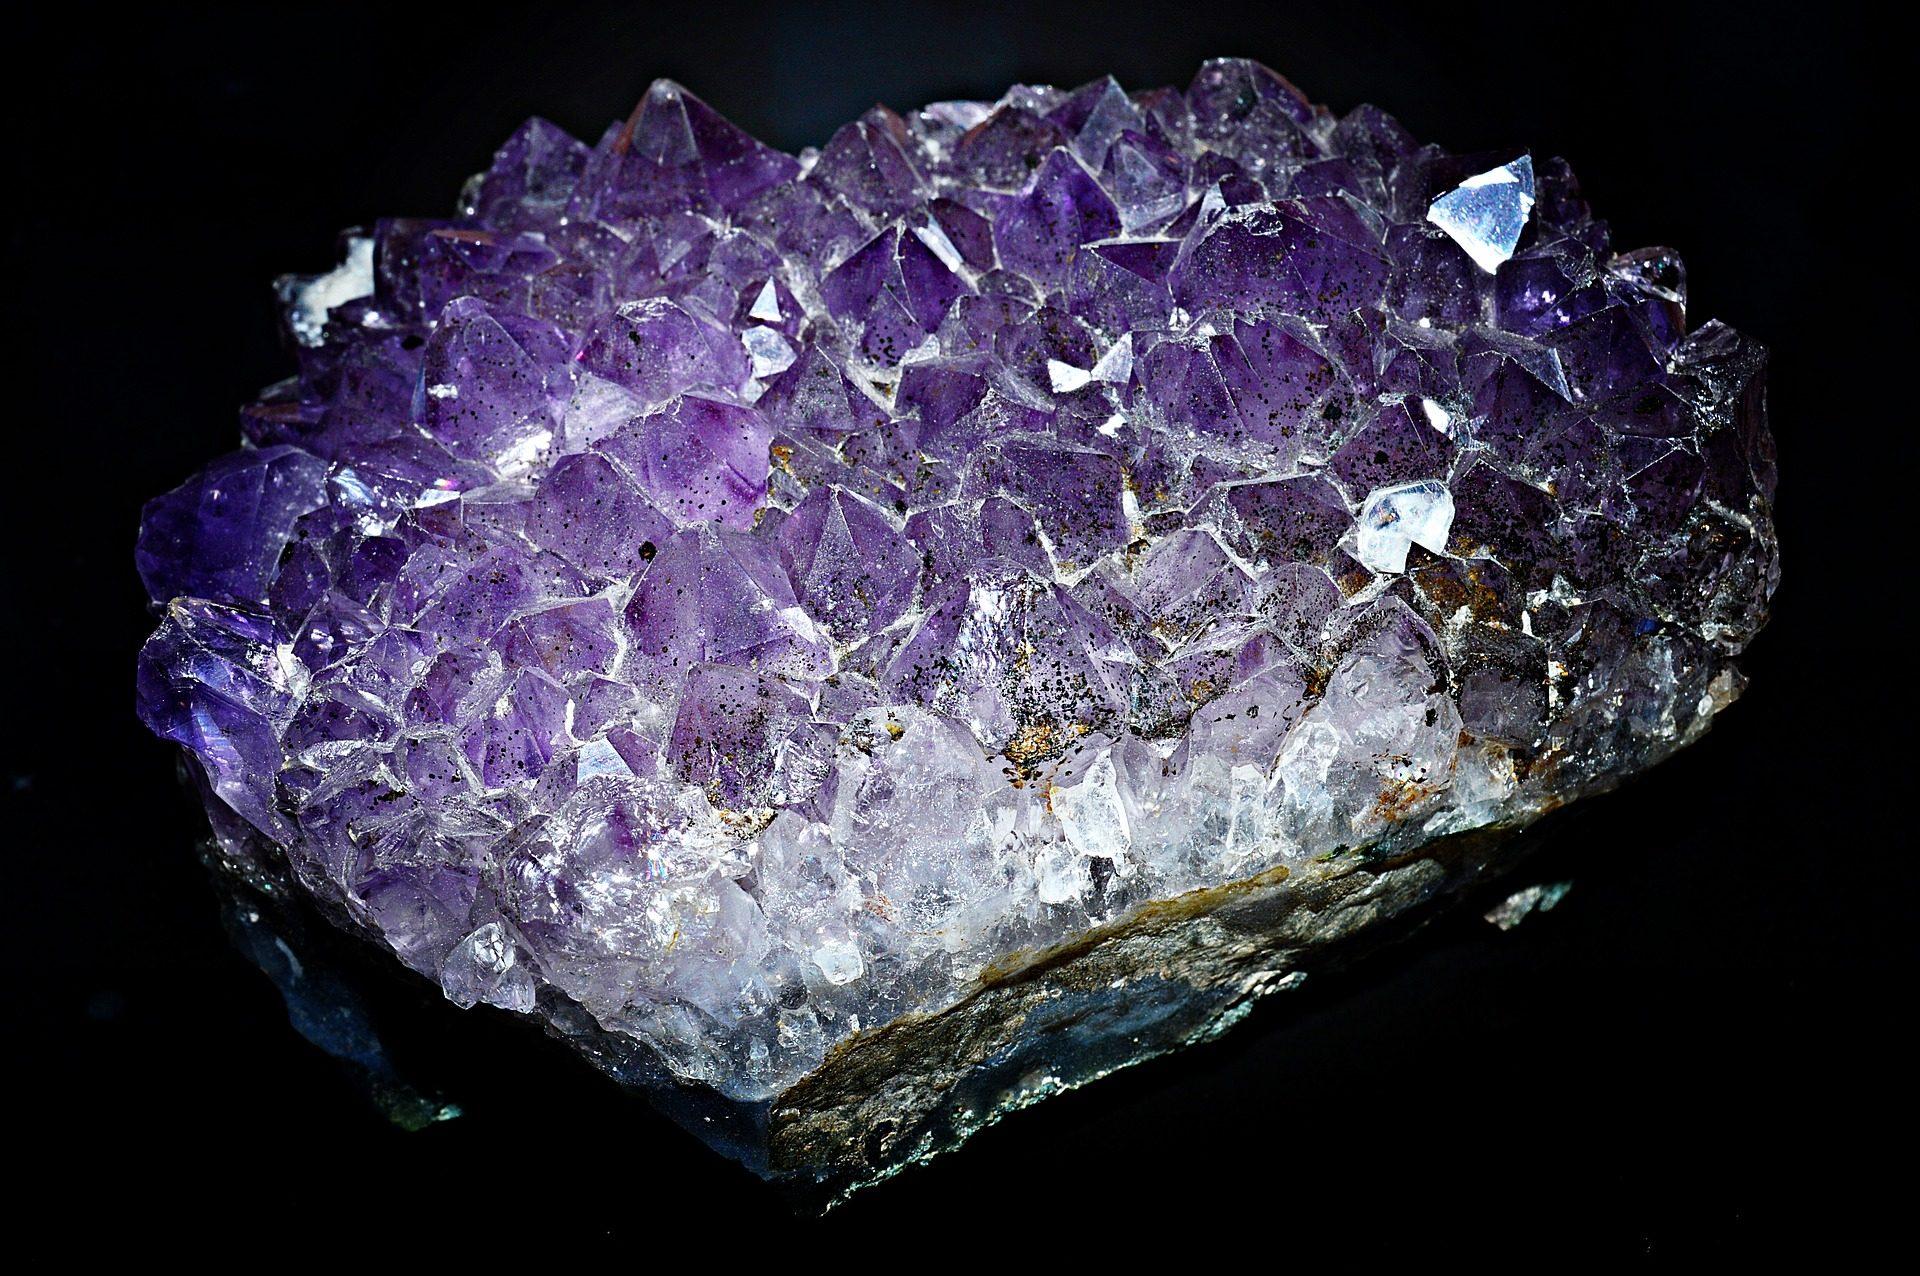 amatista, mineral, roca, cristales, púrpura, geometría - Fondos de Pantalla HD - professor-falken.com